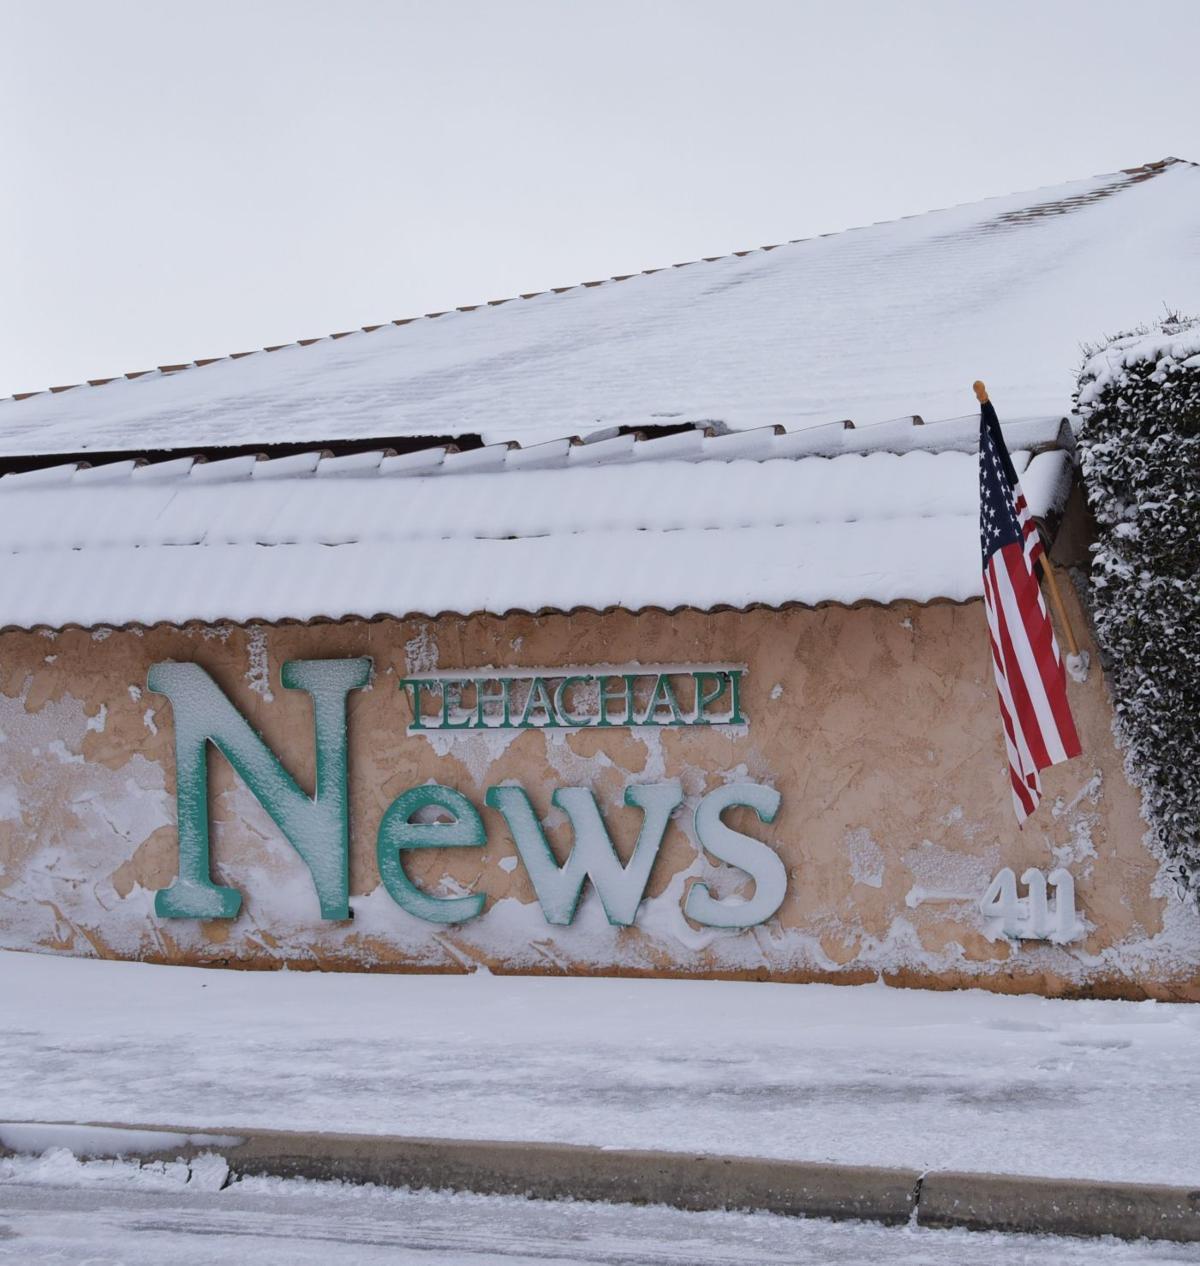 Tehachapi News office